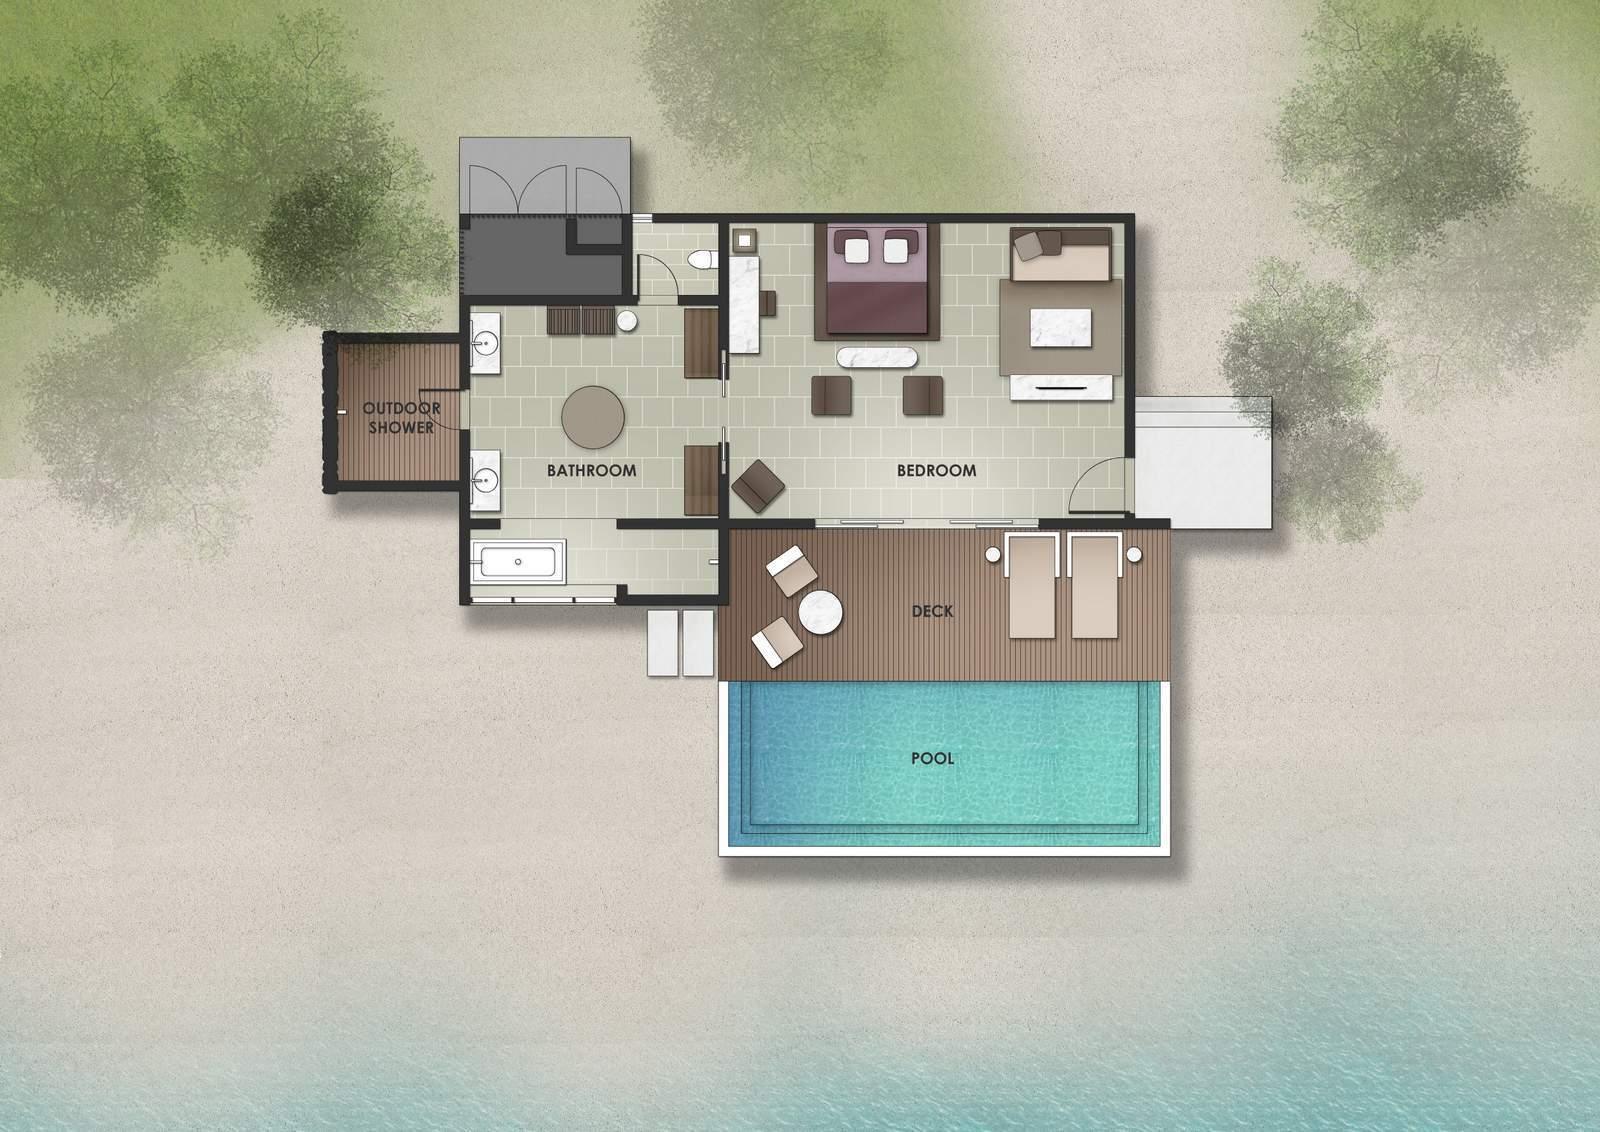 Мальдивы, отель The Residence Maldives at Dhigurah, план-схема номера Deluxe Beach Pool Villa